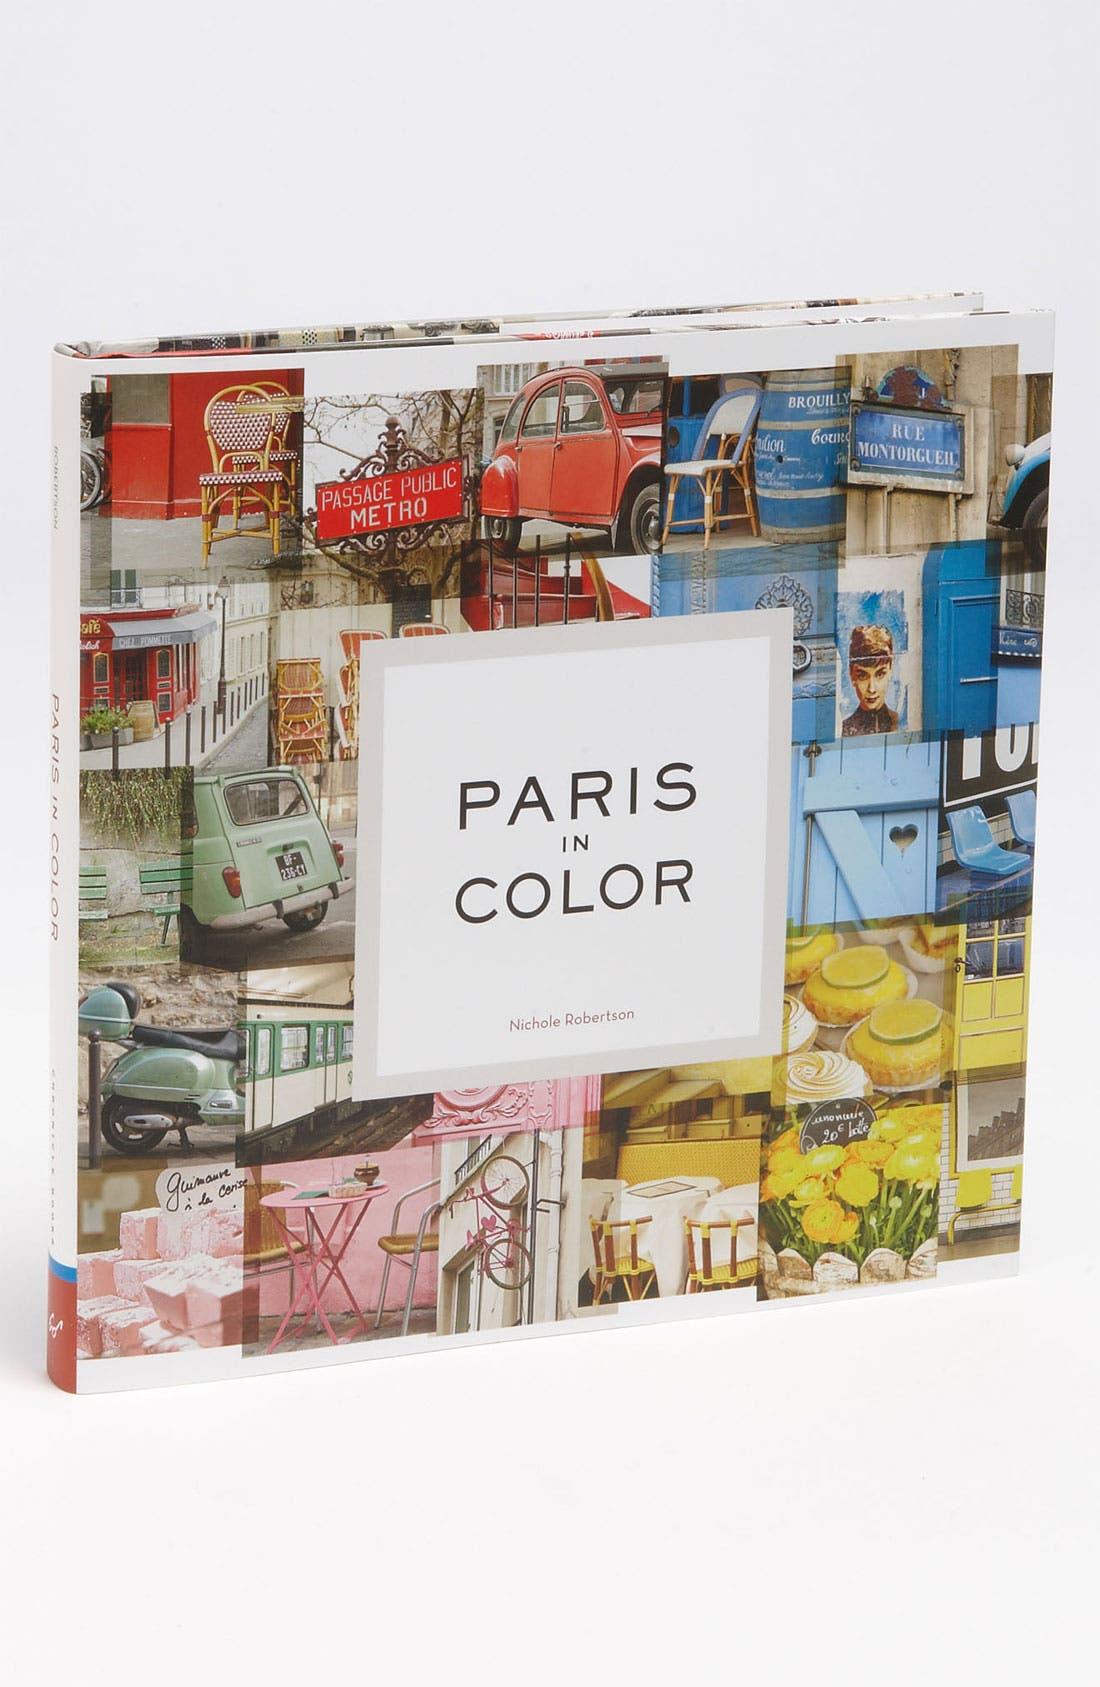 Main Image - Nichole Robertson 'Paris in Color' Book